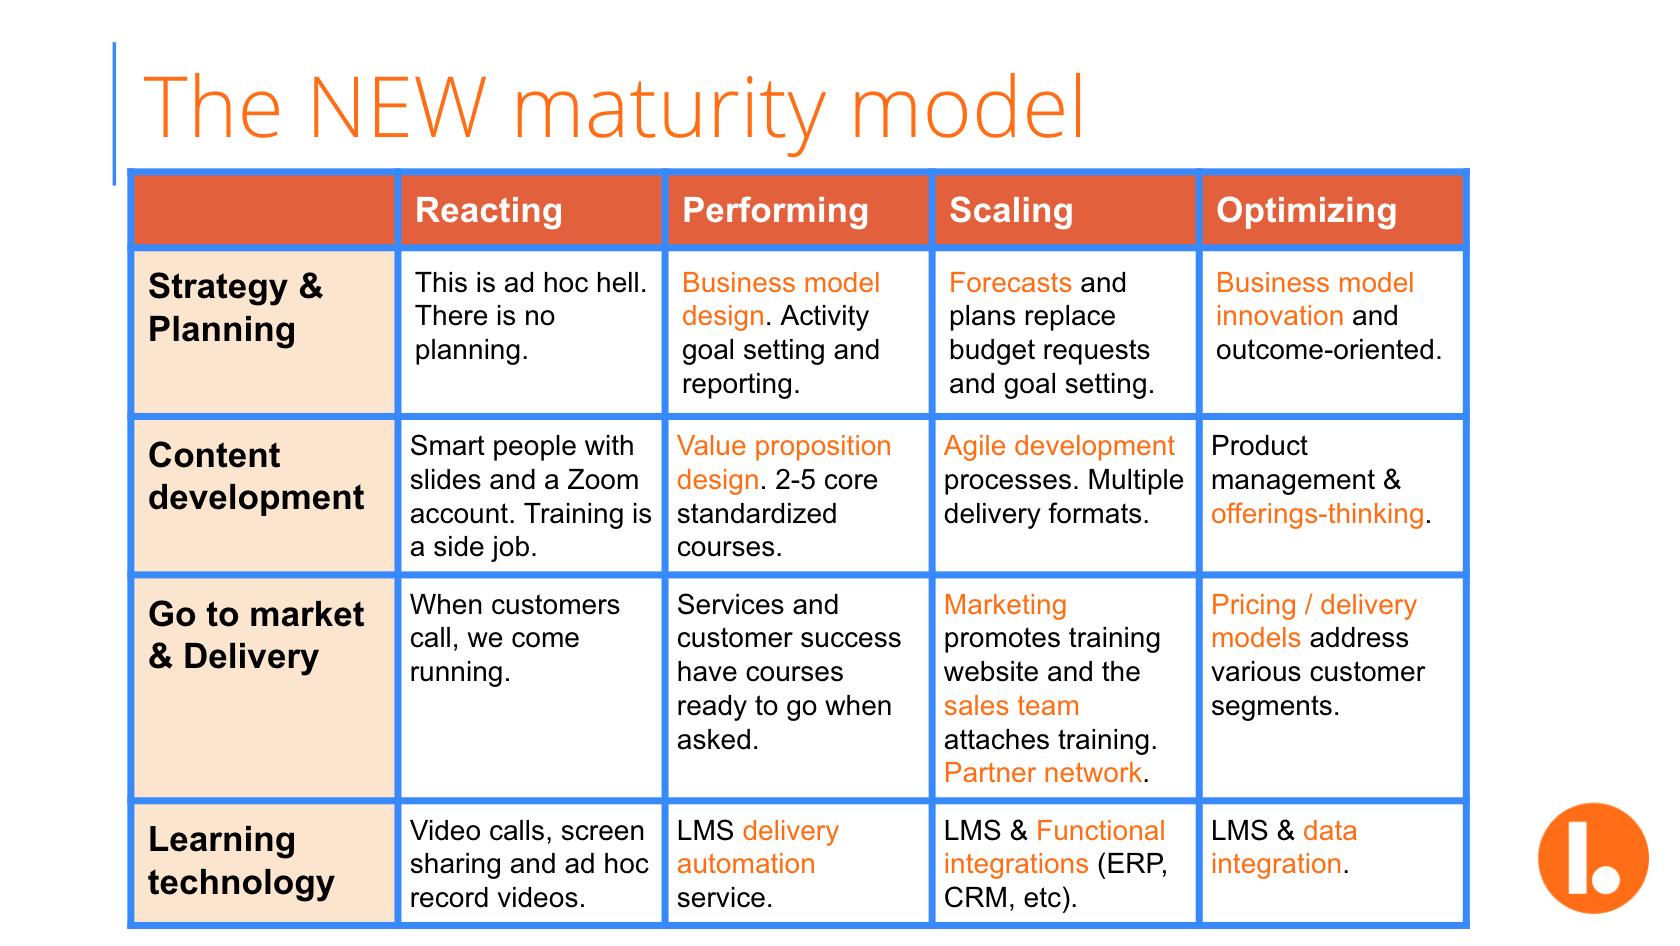 Learndot Customer Education Maturity Model Redux